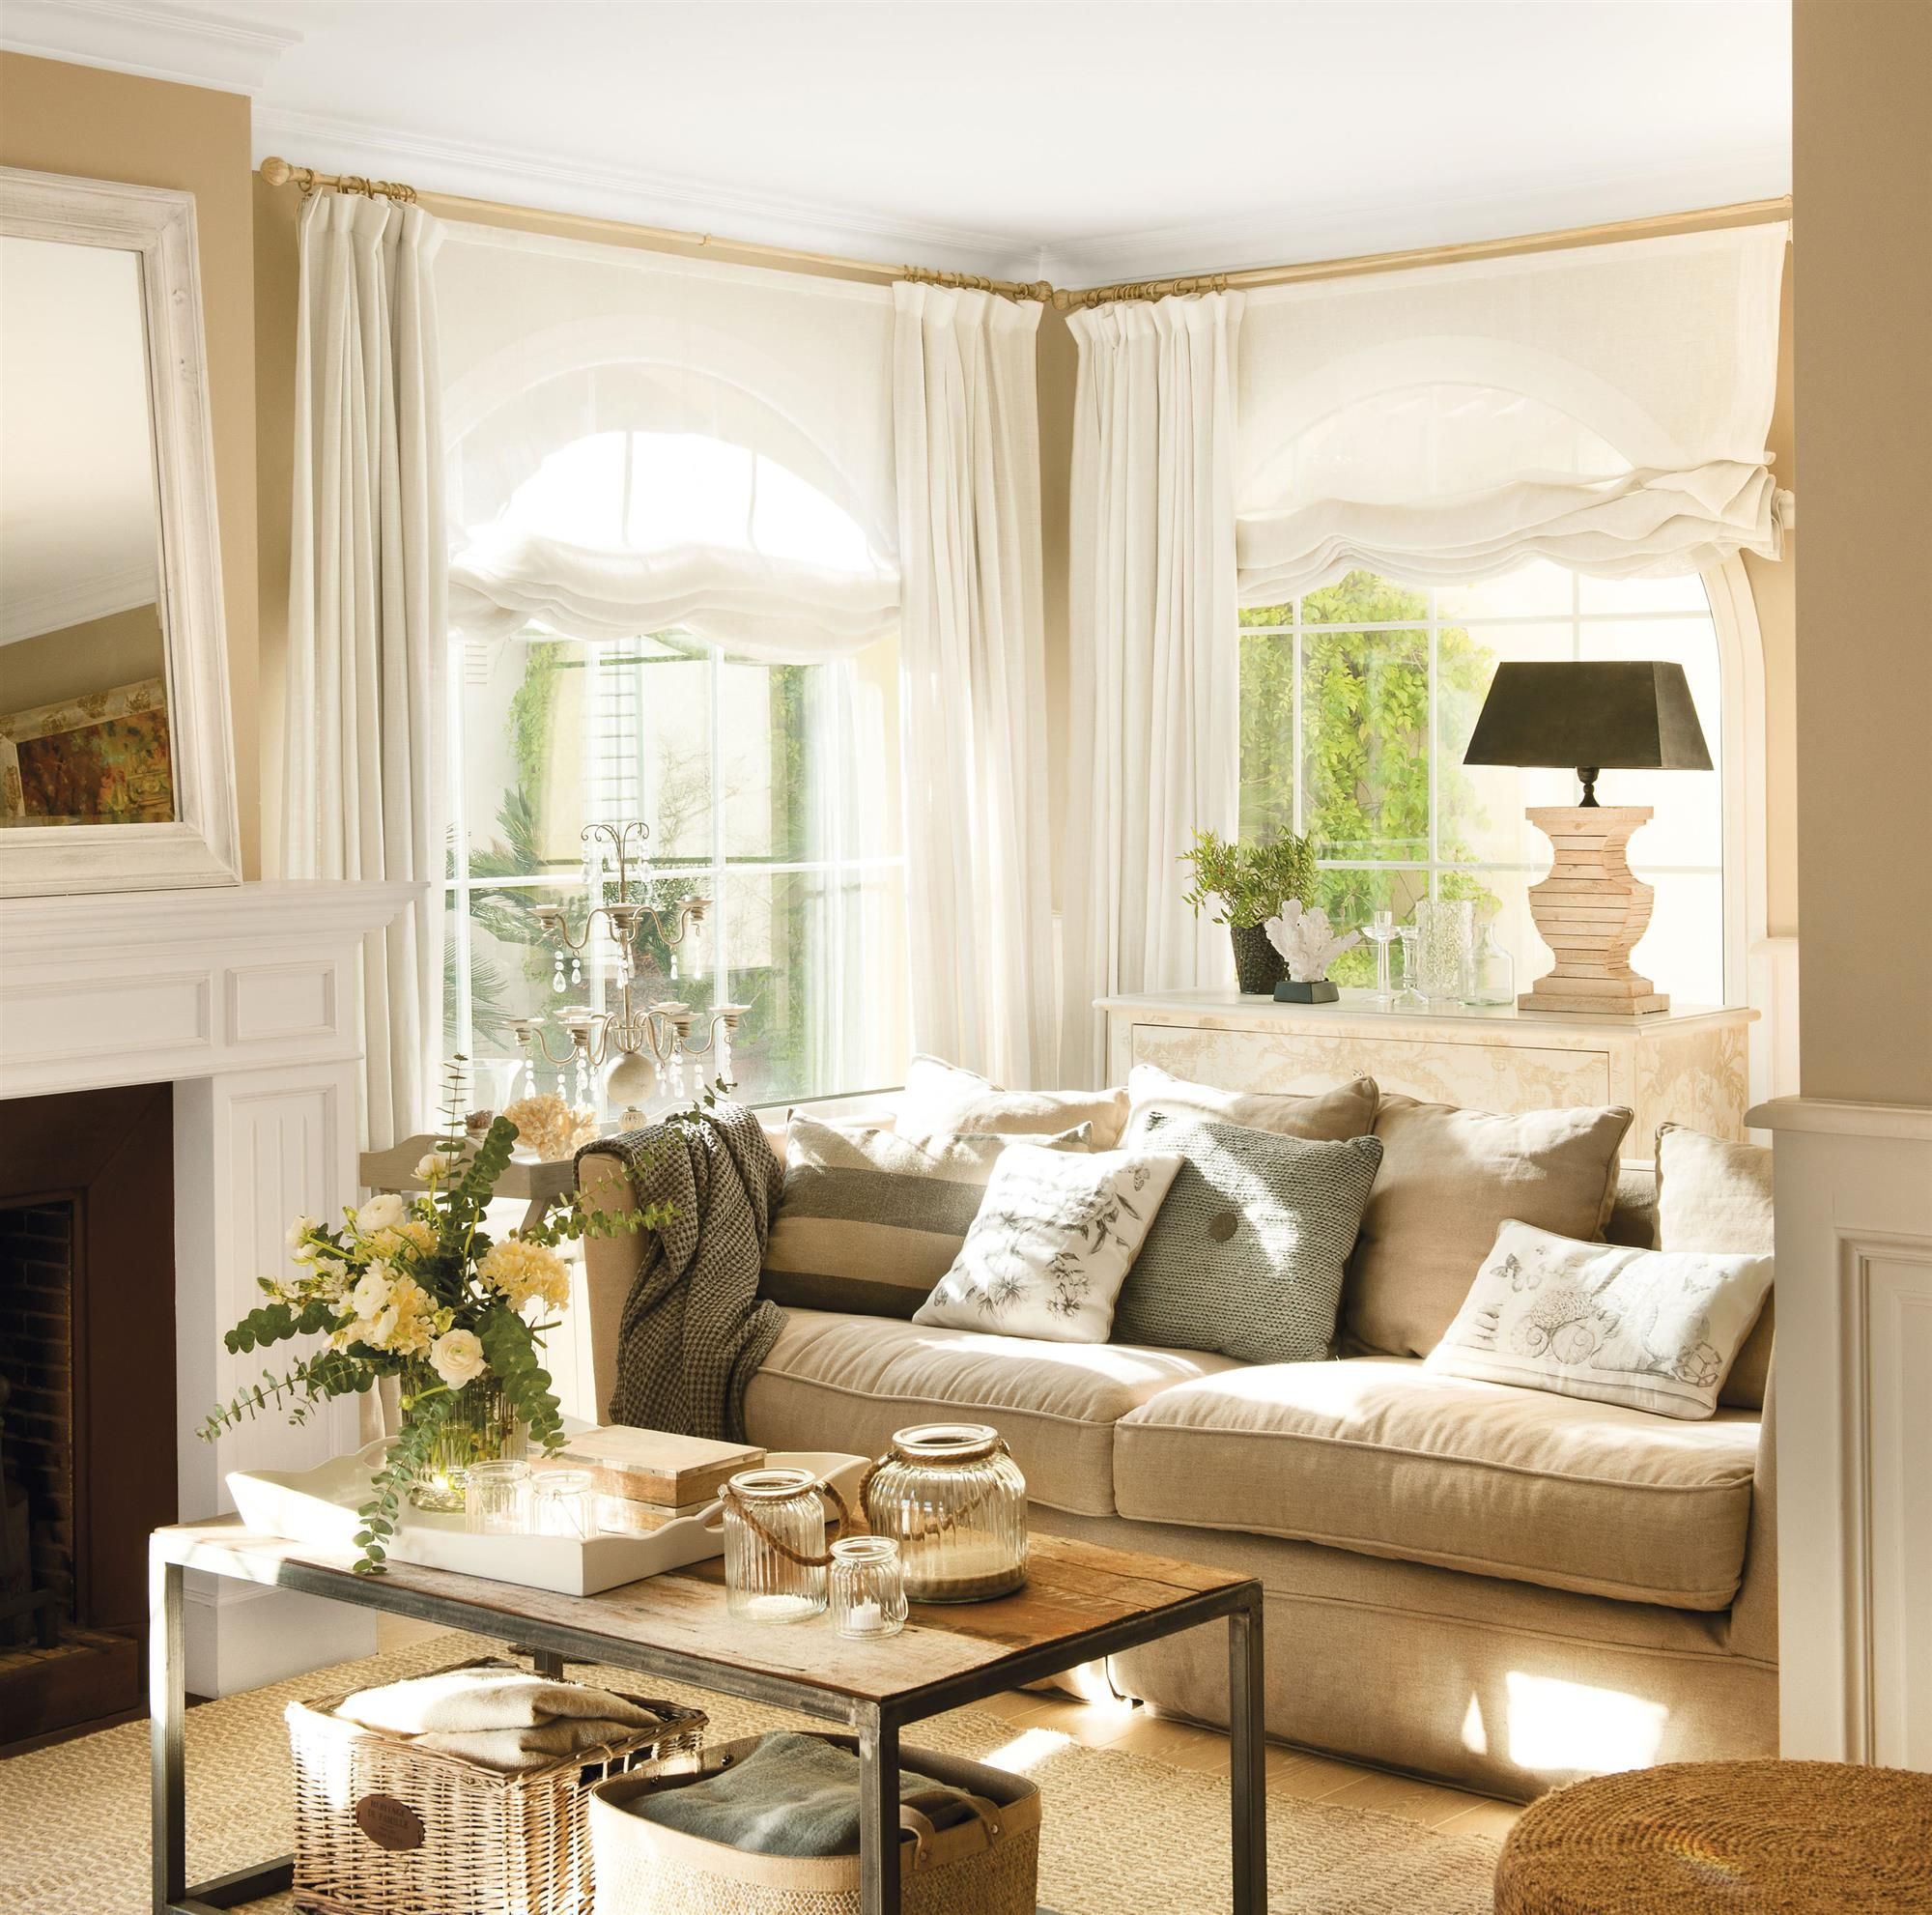 Escoger cortinas salones muy acogedores pinterest for Cortinas salon beige